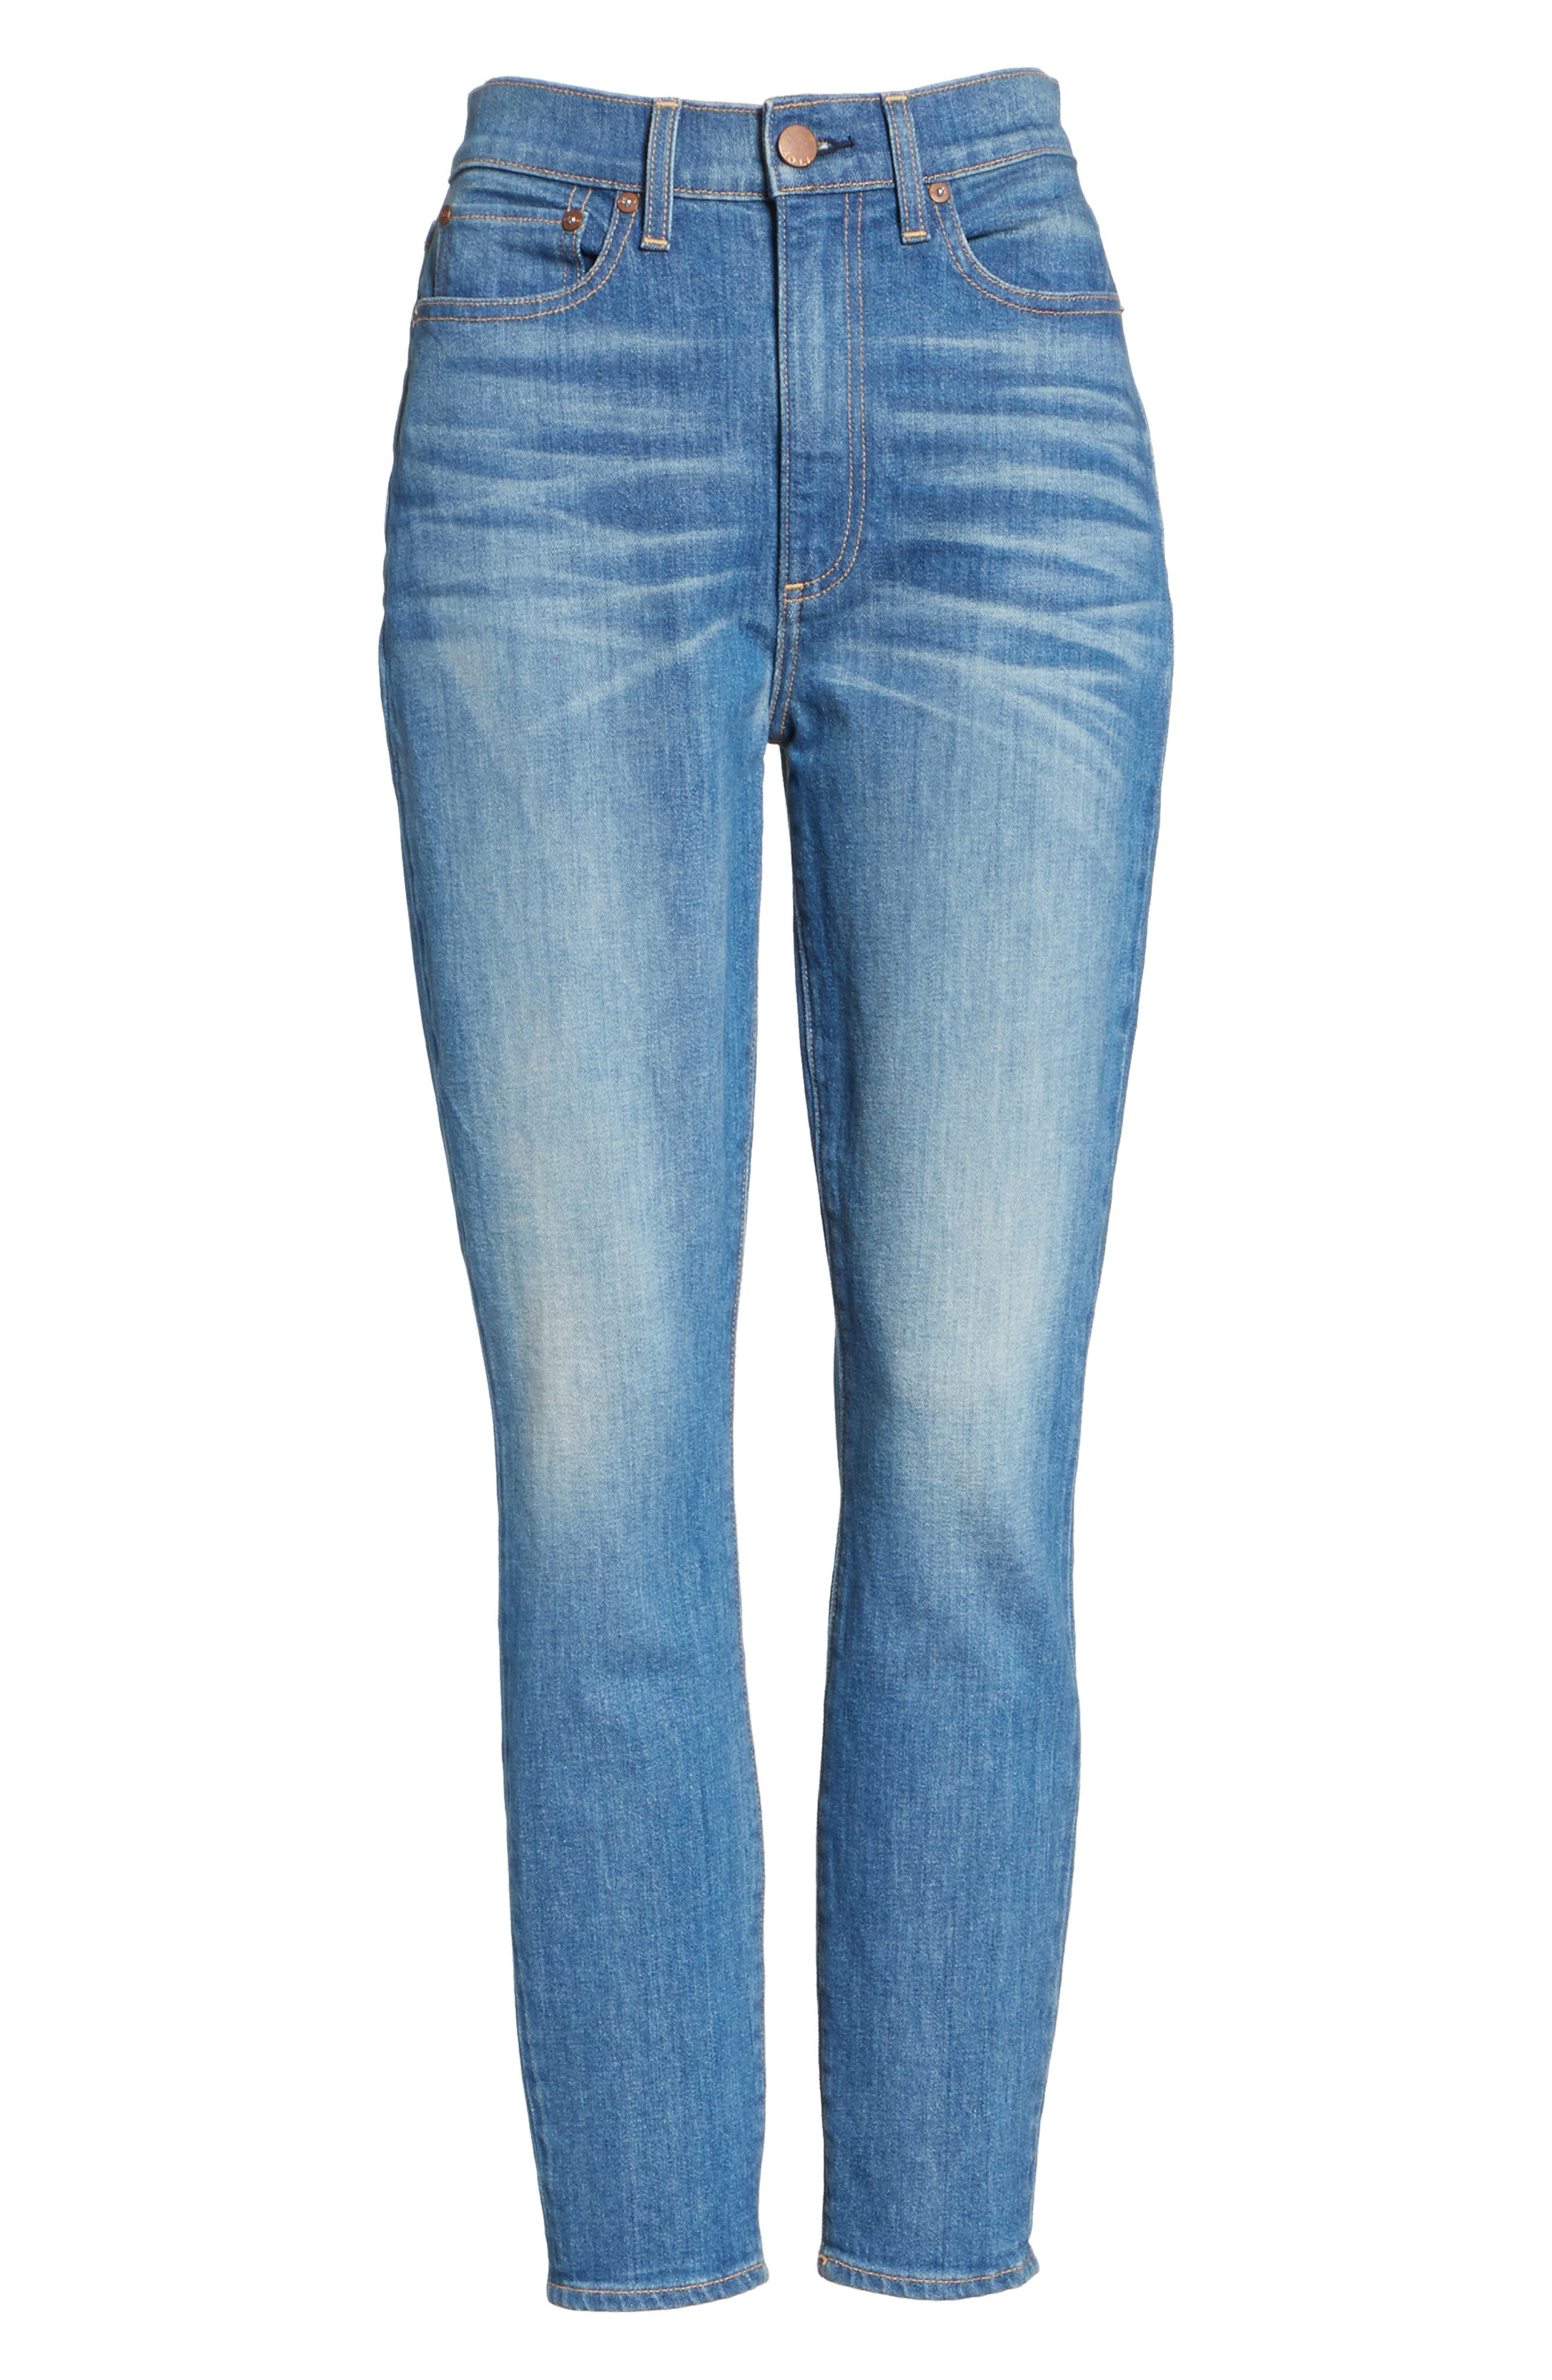 AO.LA Good High Waist Ankle Skinny Jeans,                             Alternate thumbnail 6, color,